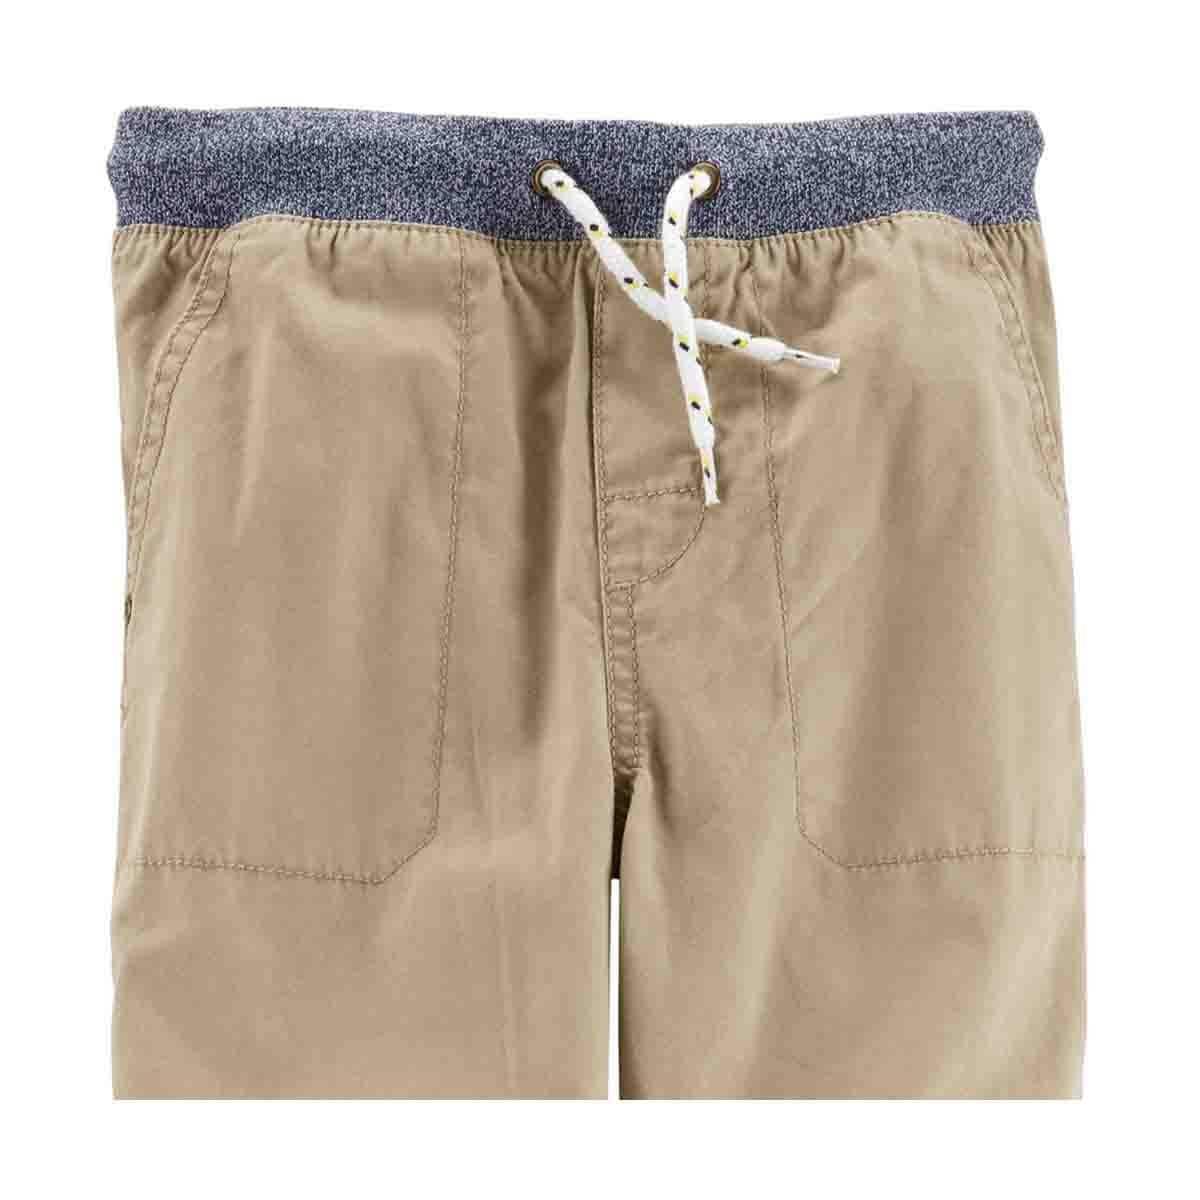 Pantalon Color Khaki Carters